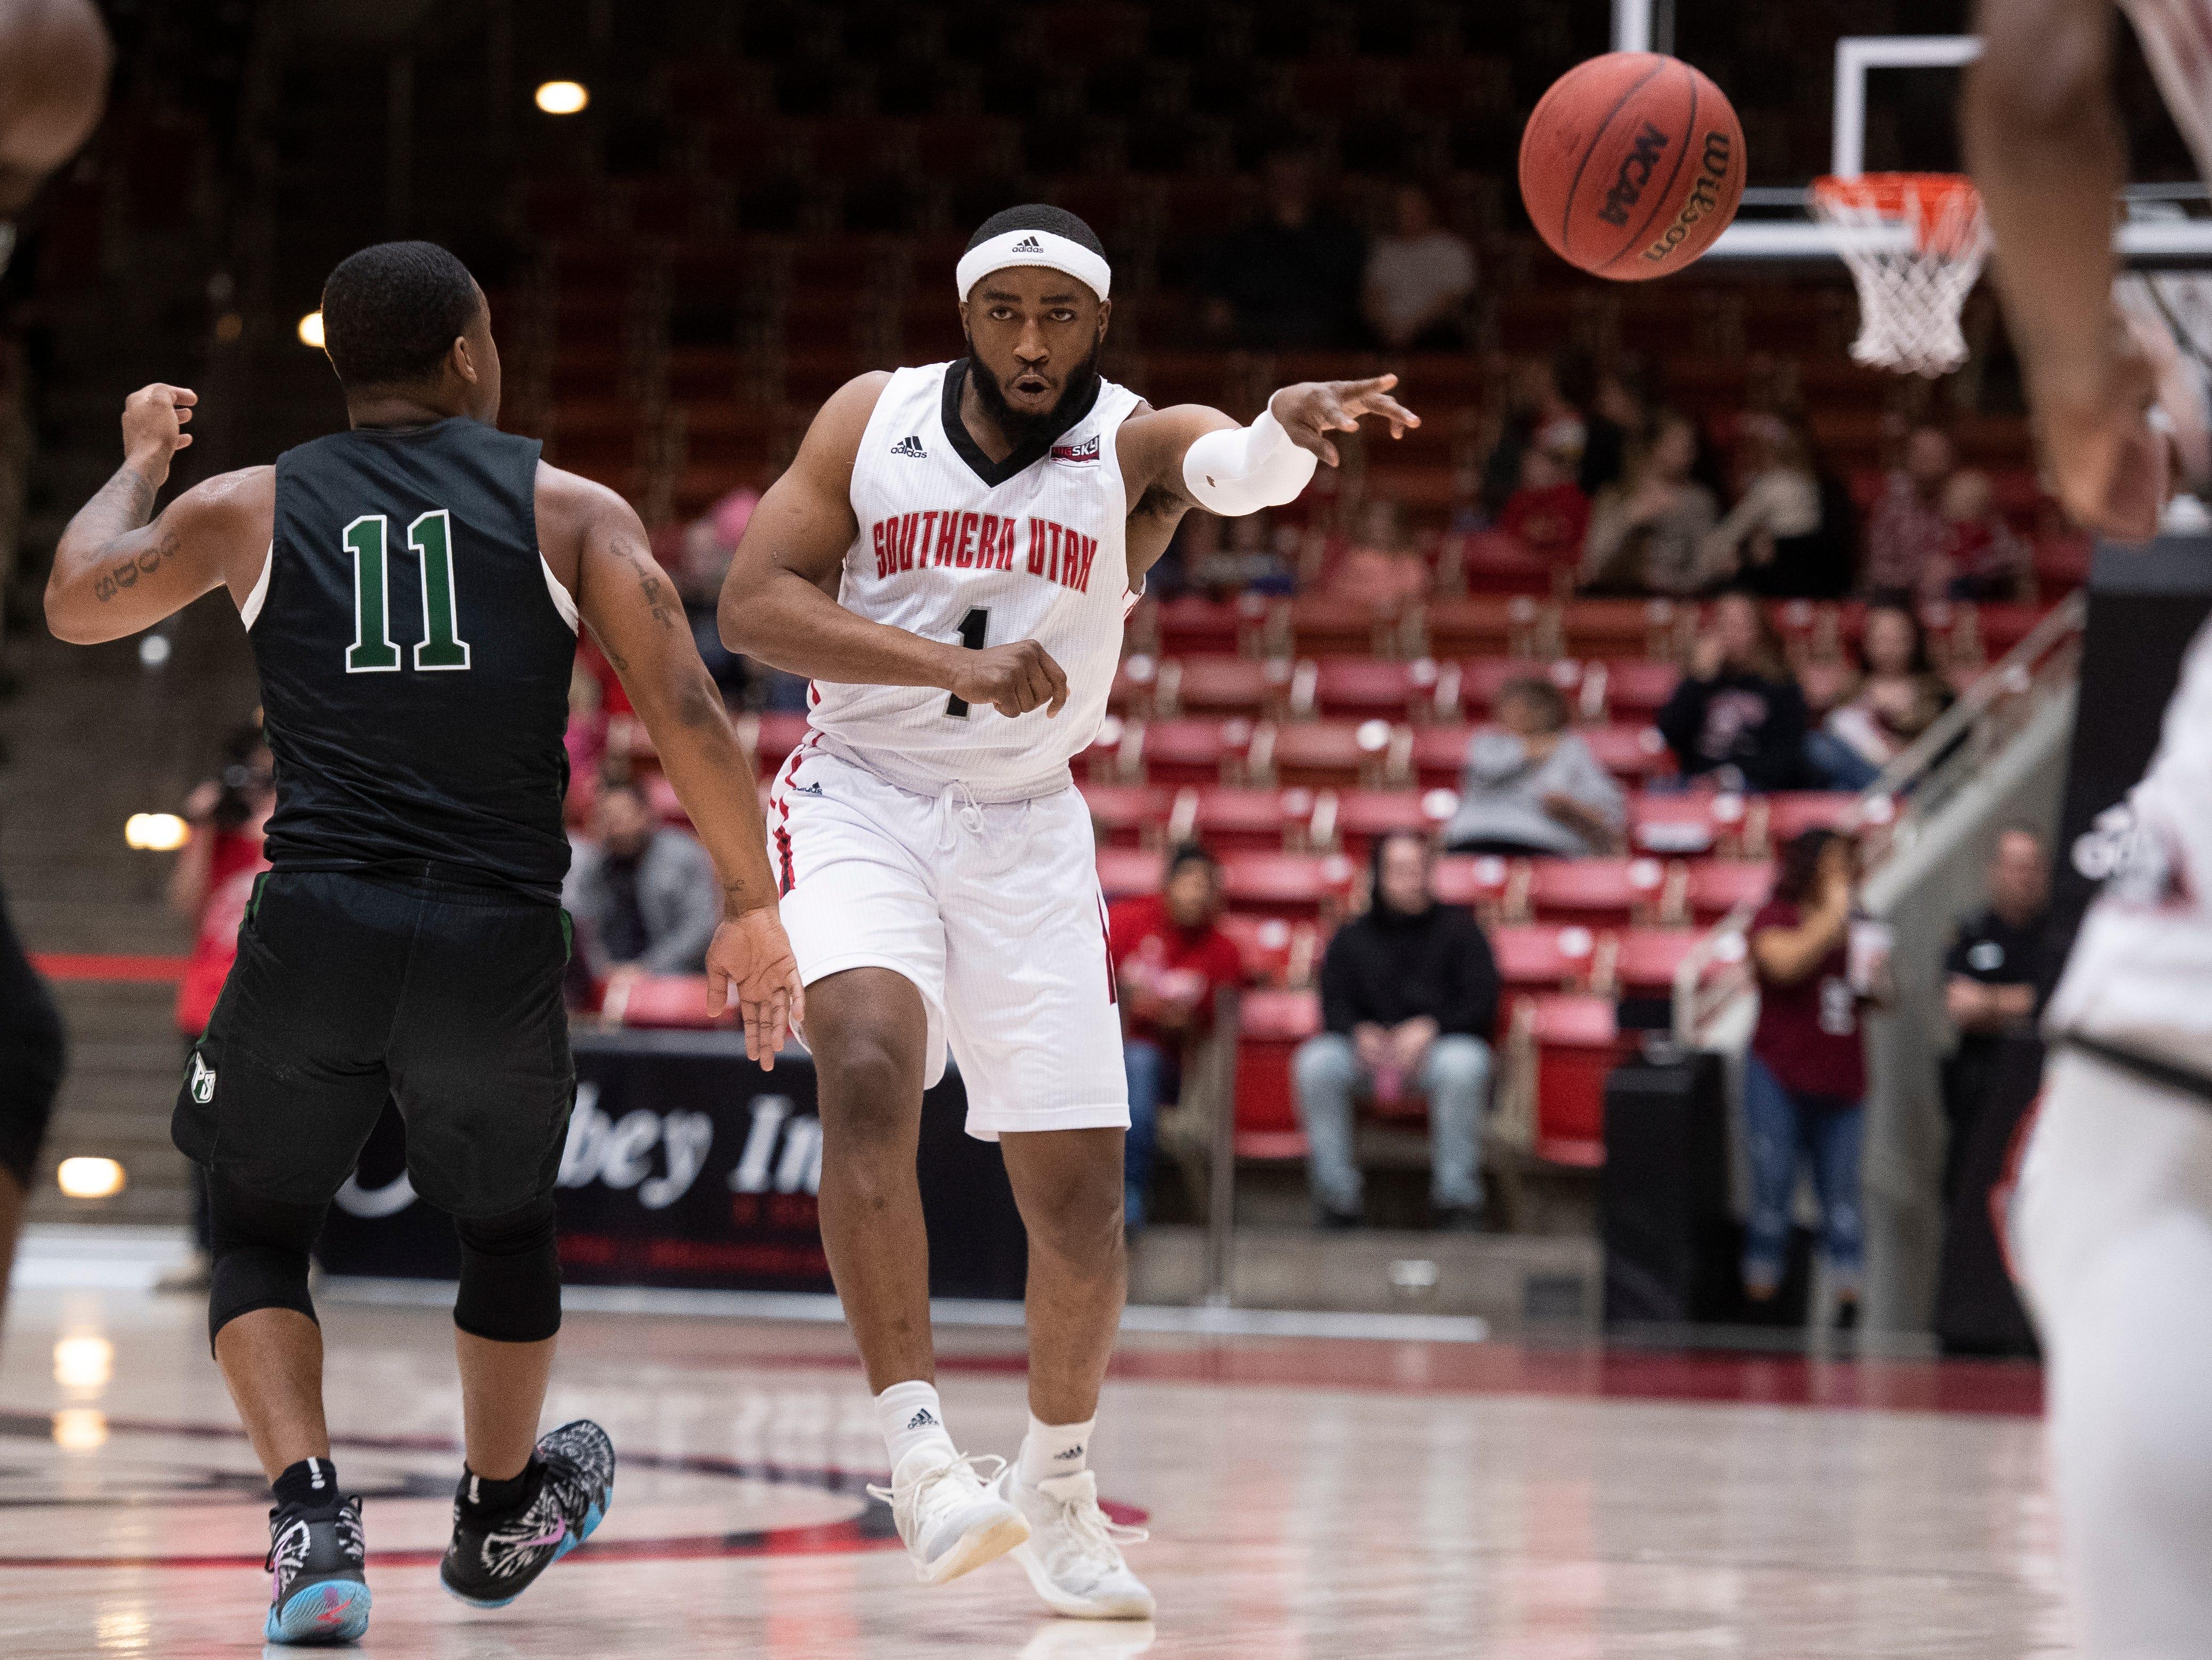 Southern Utah University freshman Kenton Eskridge (1) throws a pass against Portland State in the America First Event Center Thursday, January 17, 2019. SUU won, 83-69.